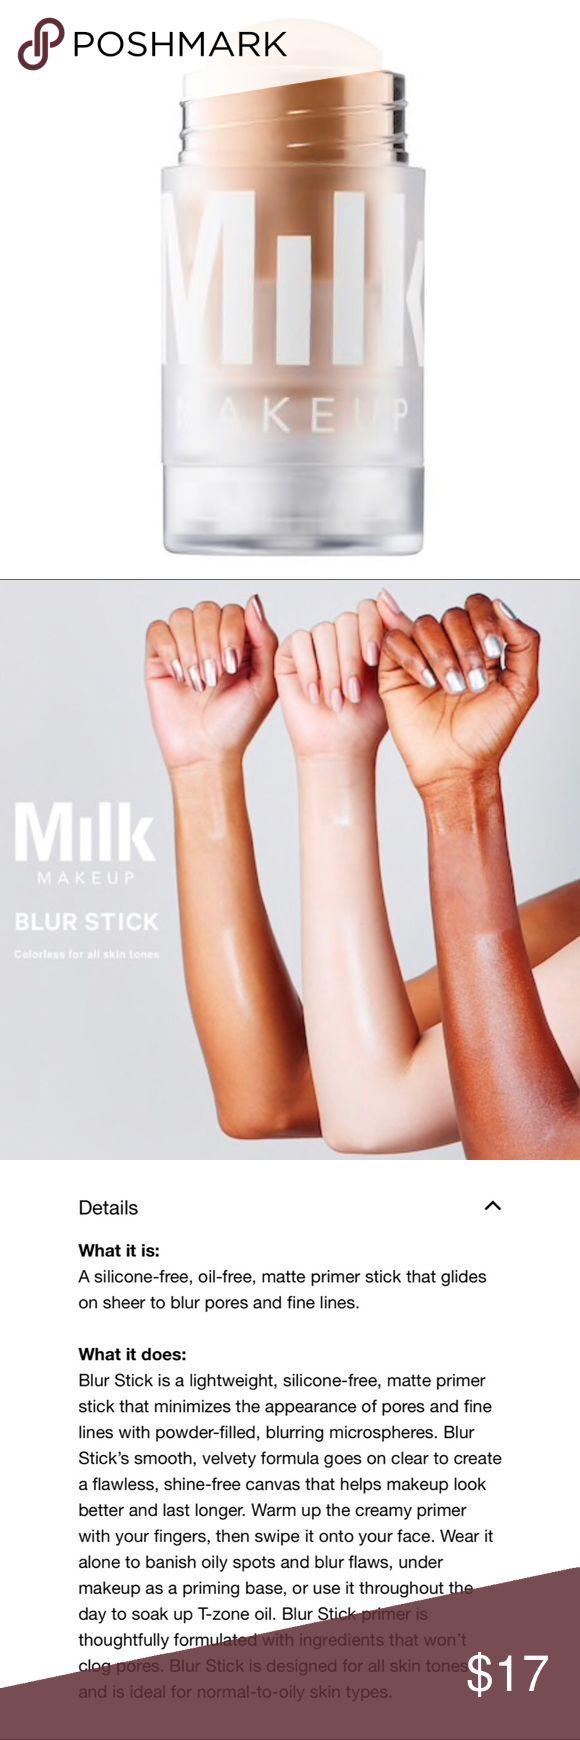 Milk Makeup Blur Stick Milk makeup blur stick, Milk